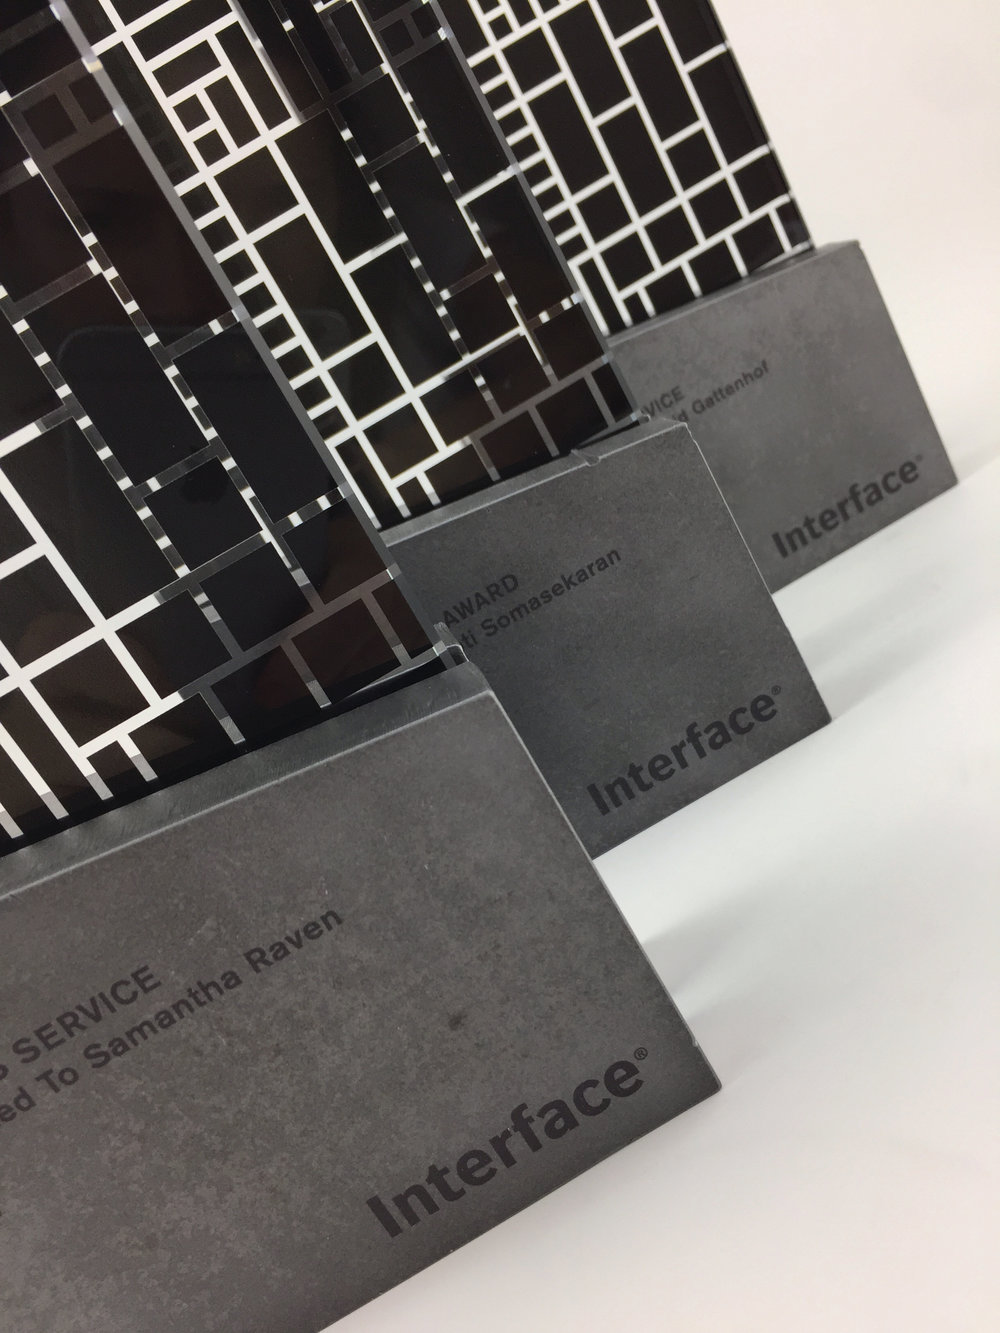 interface-awards-metal-glass-graphic-art-trophy-04.jpg